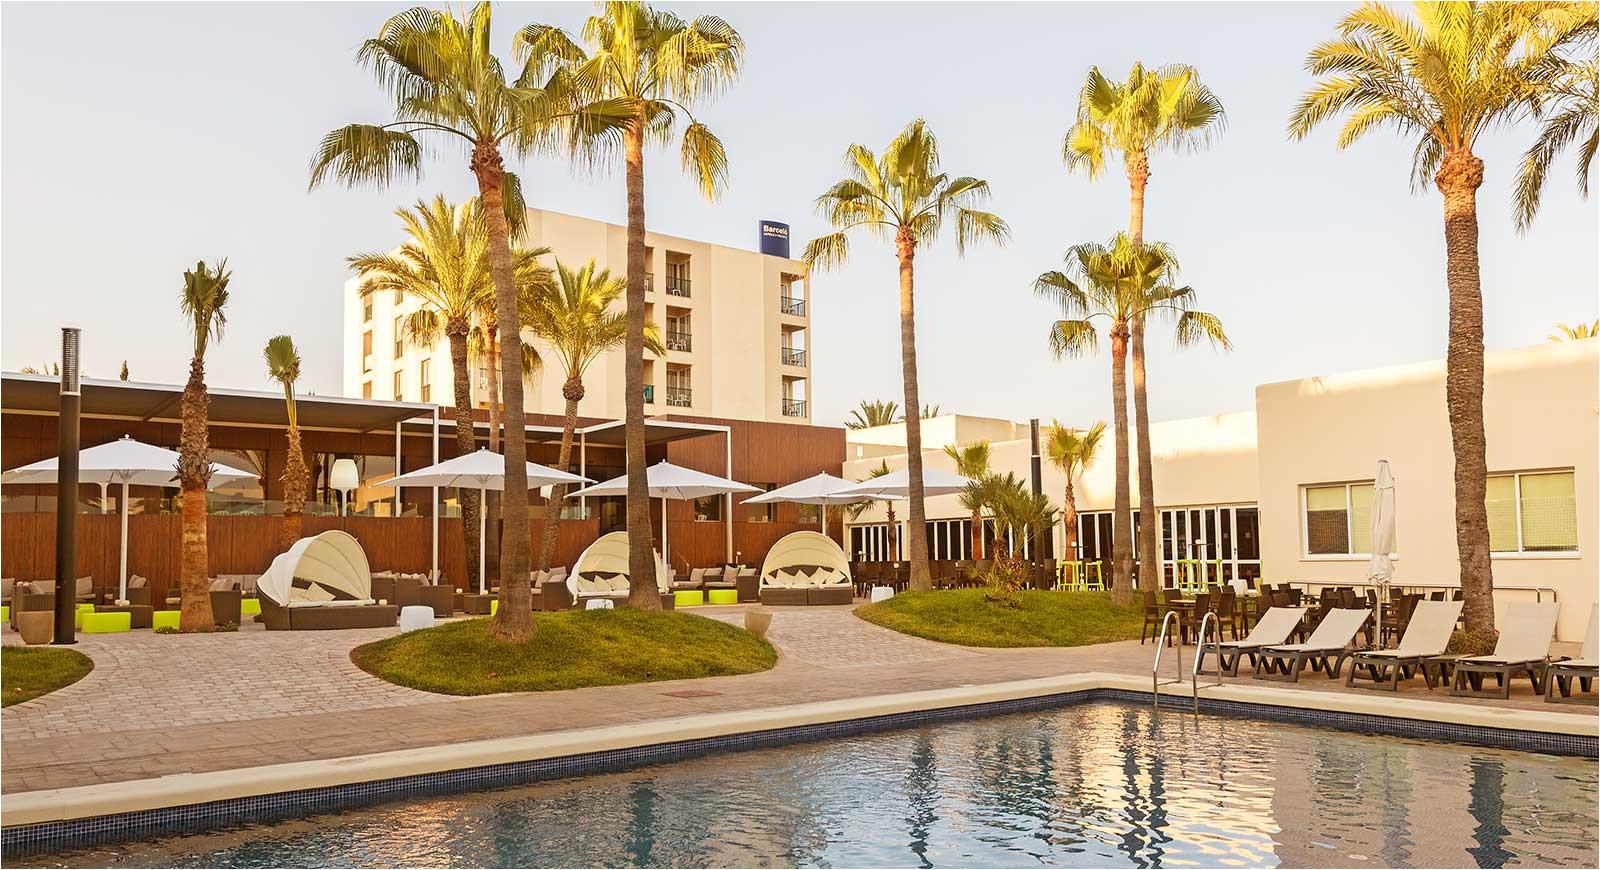 102 swimming pool 12 hotel barcelo pueblo ibiza tcm20 40869 jpg